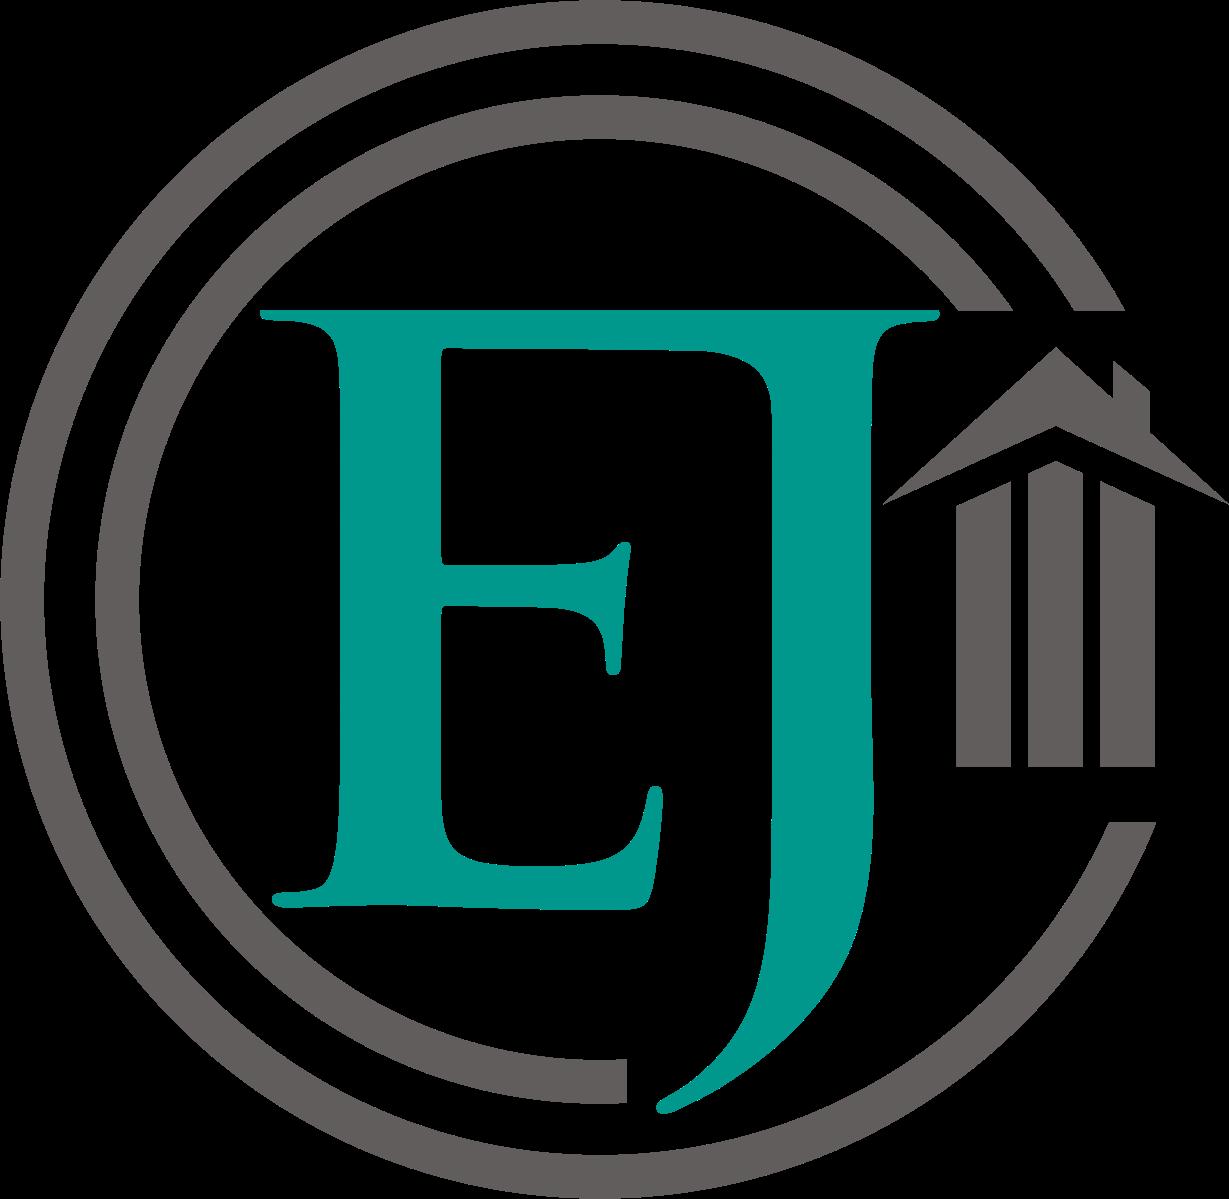 EJCC_edited_edited